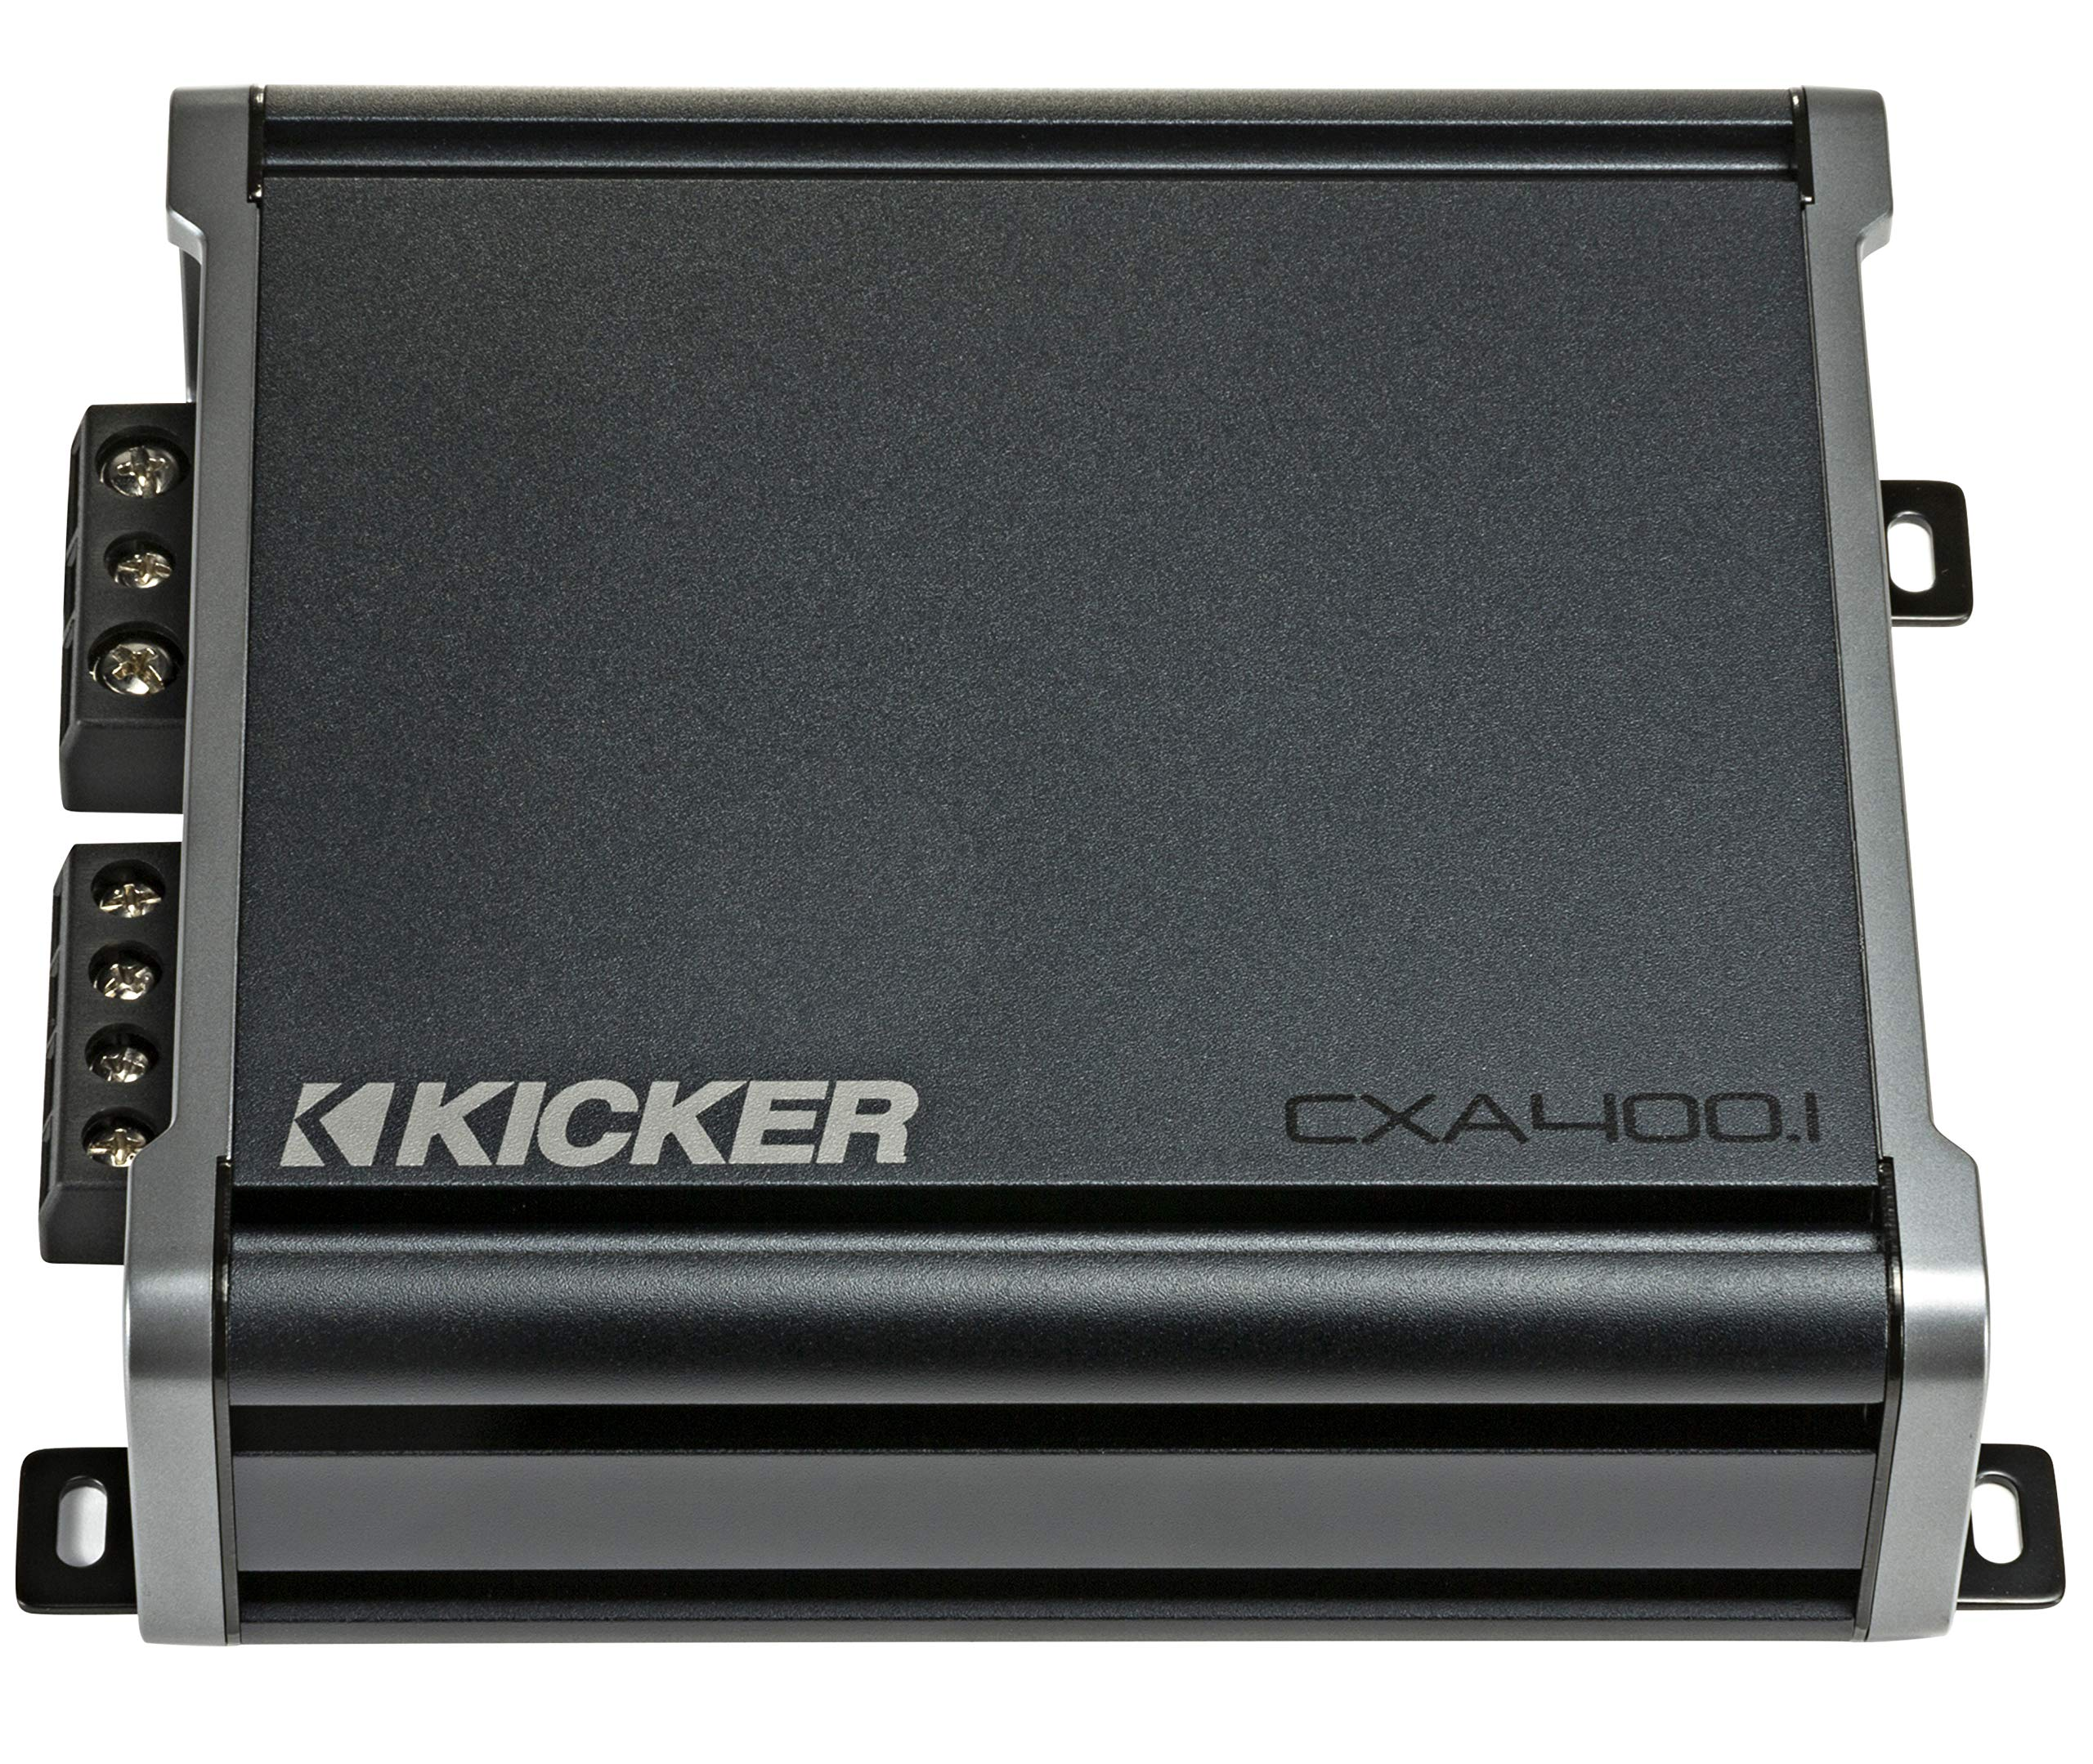 Kicker 46CXA4001 Car Audio Class D Amp Mono 800W Peak Sub Amplifier CXA400.1 New